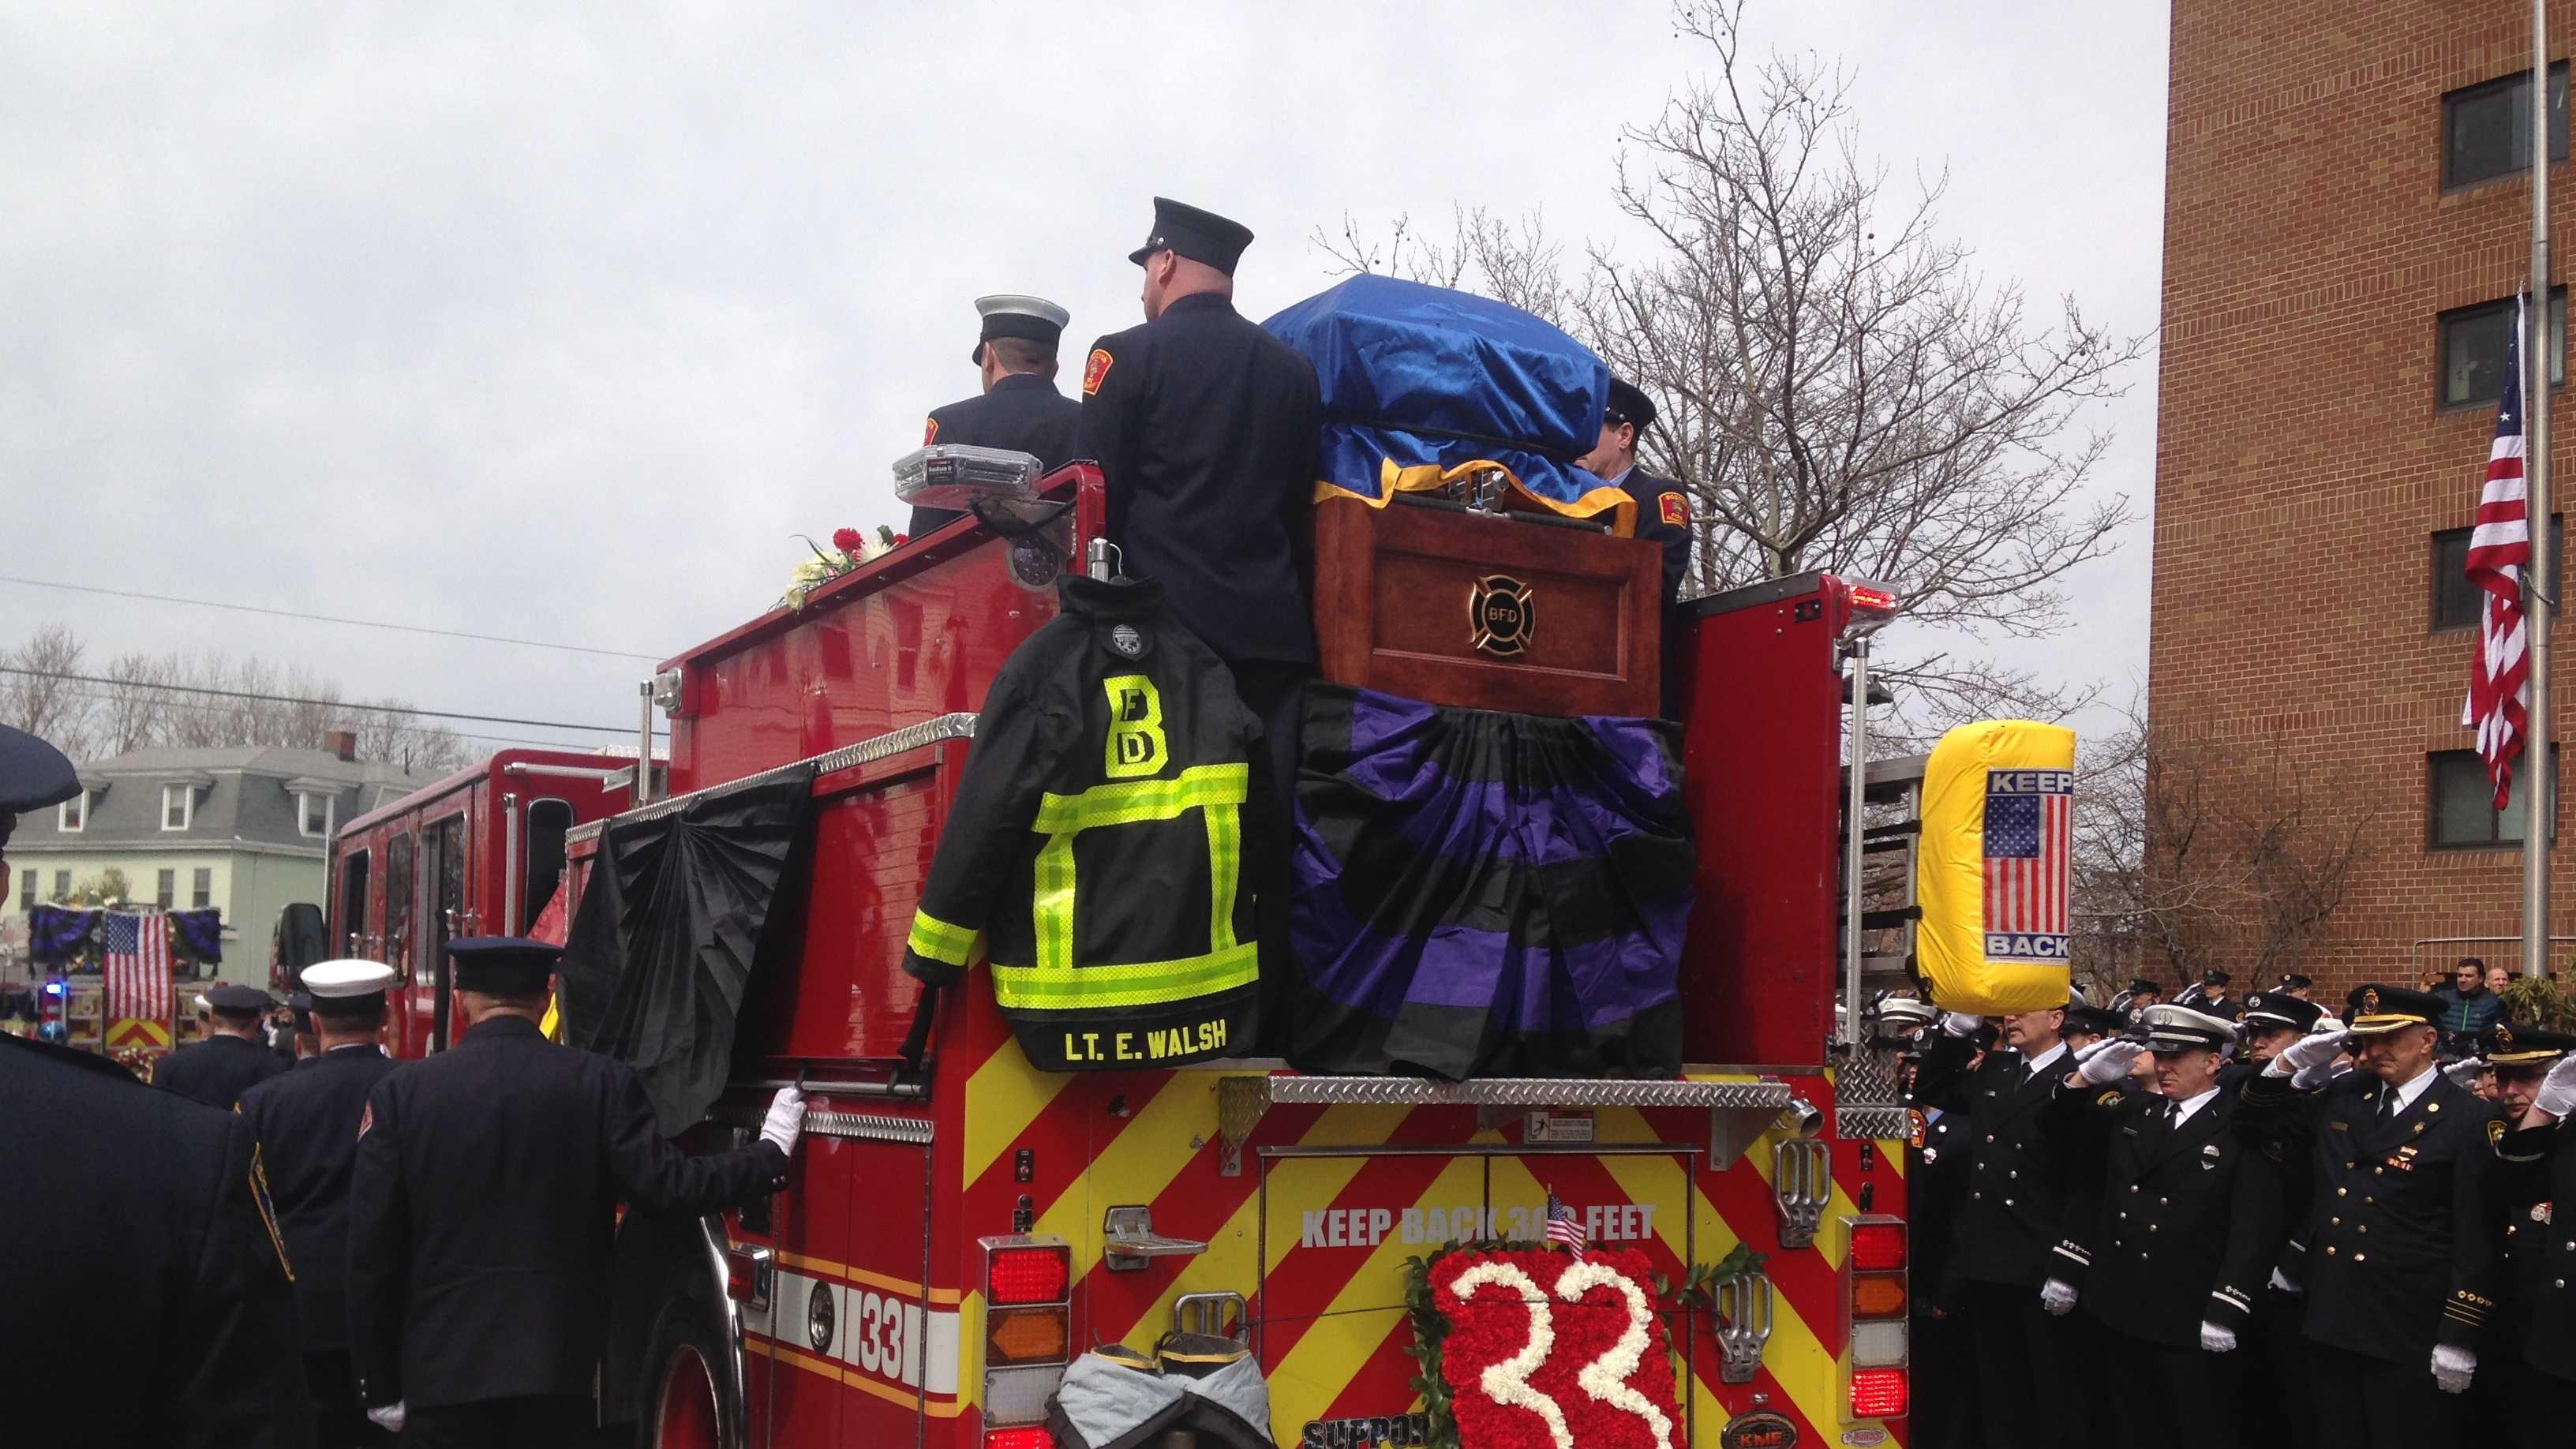 Walsh Funeral Casket on Engine after funeral 4.2.14